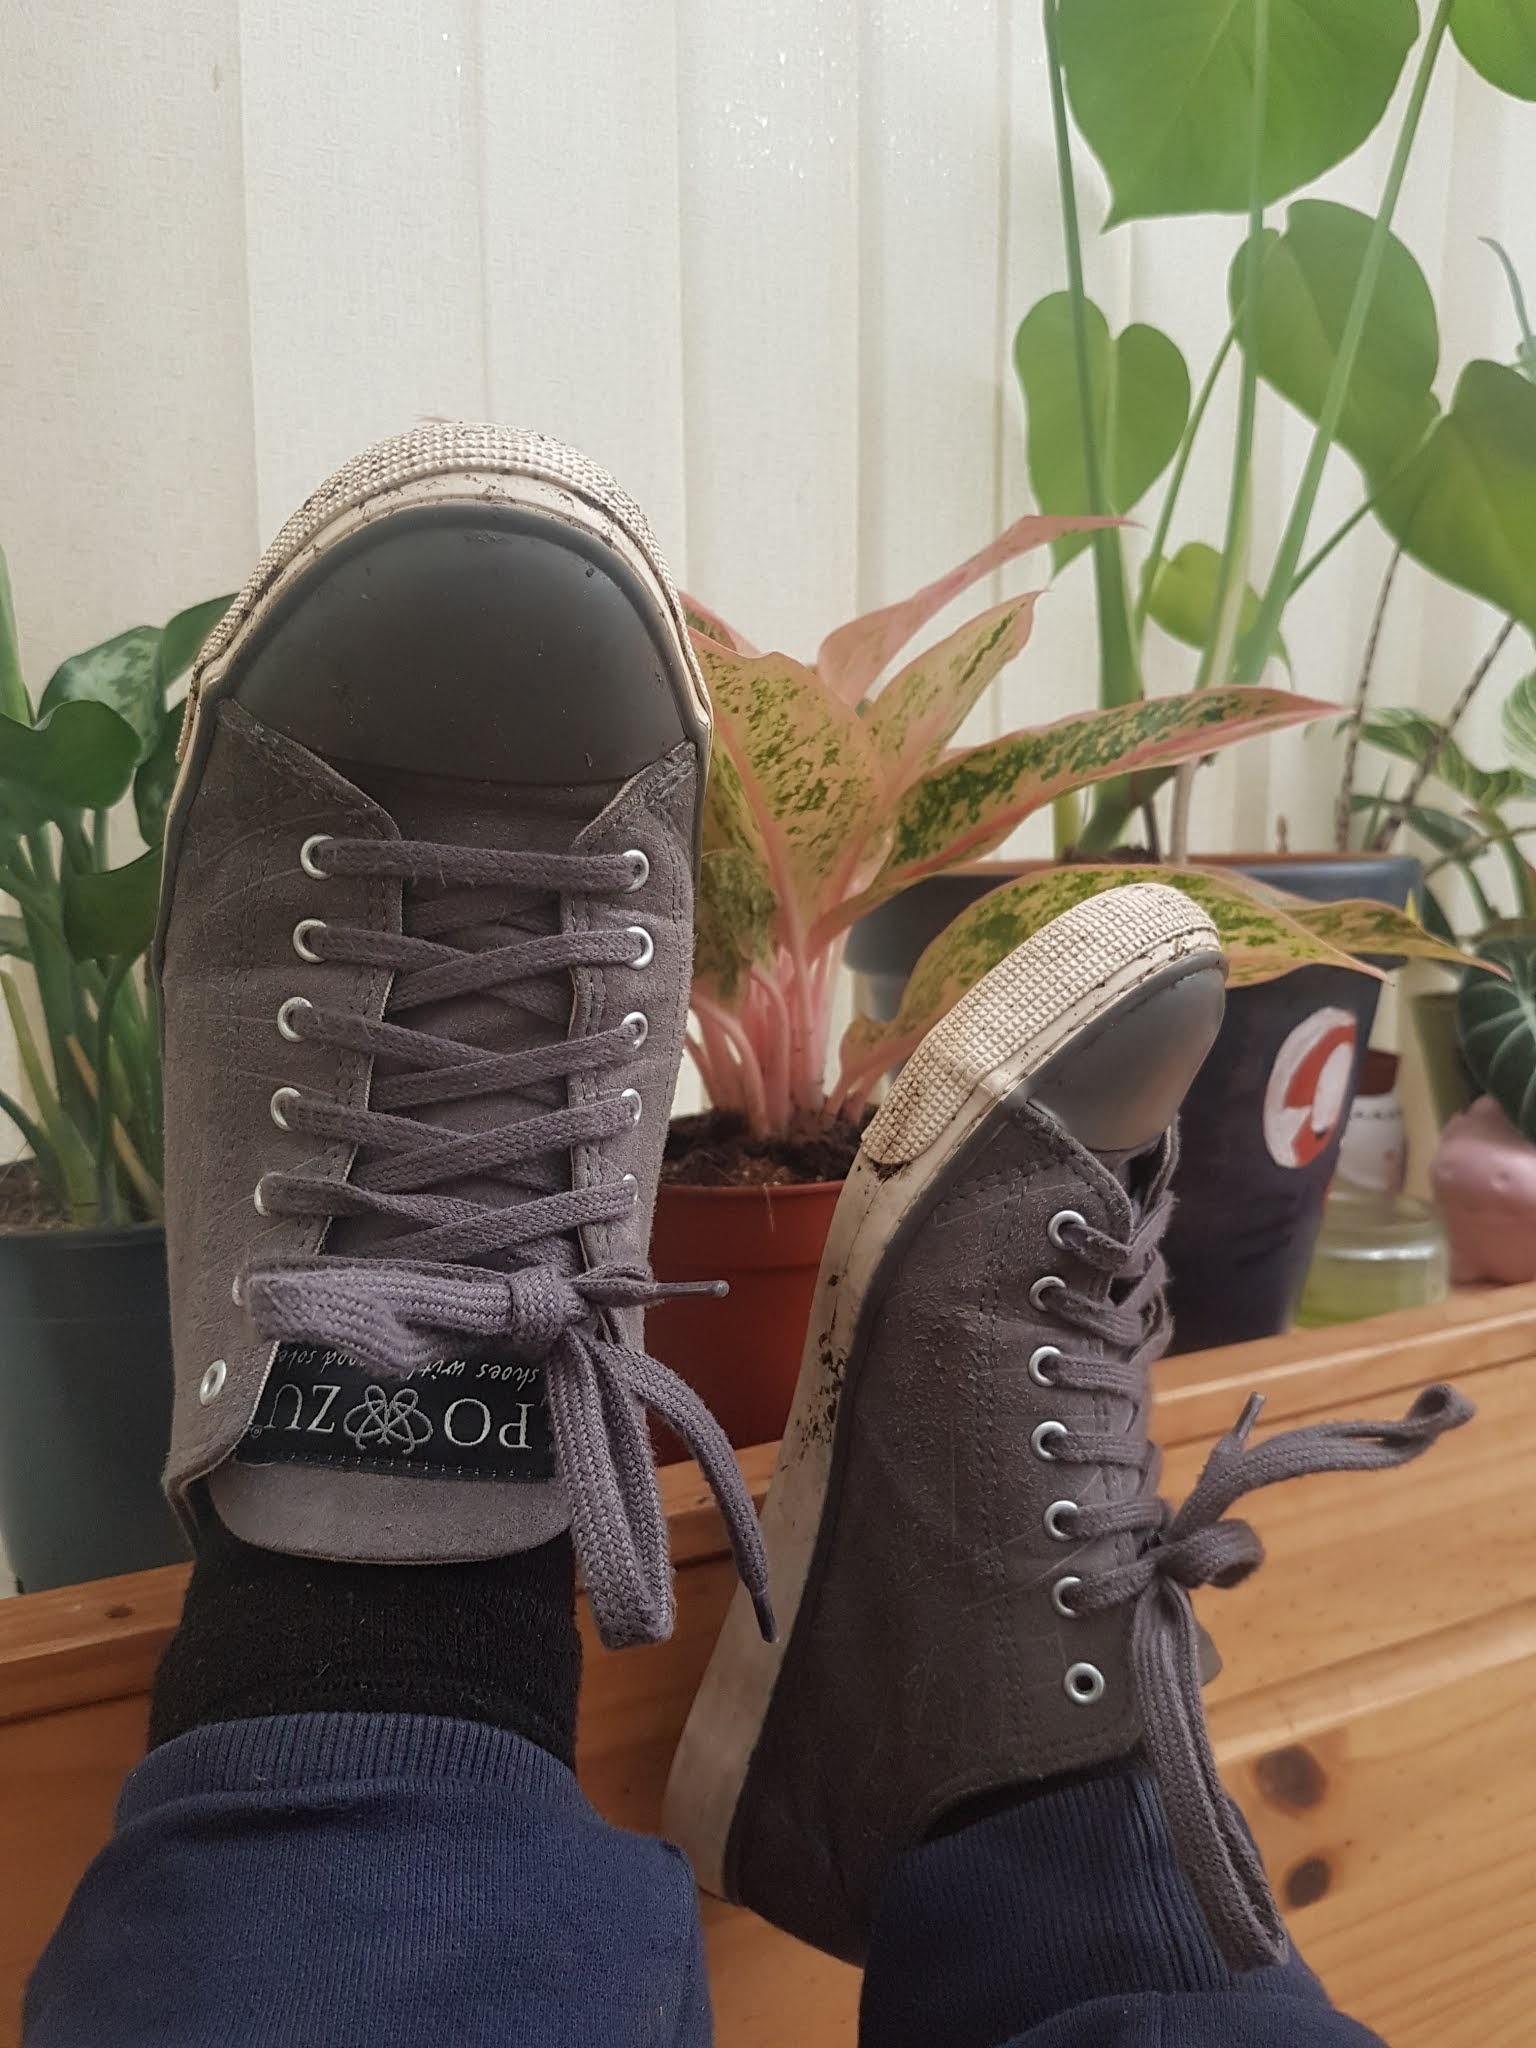 grey vegan sneakers kicked up next to houseplants